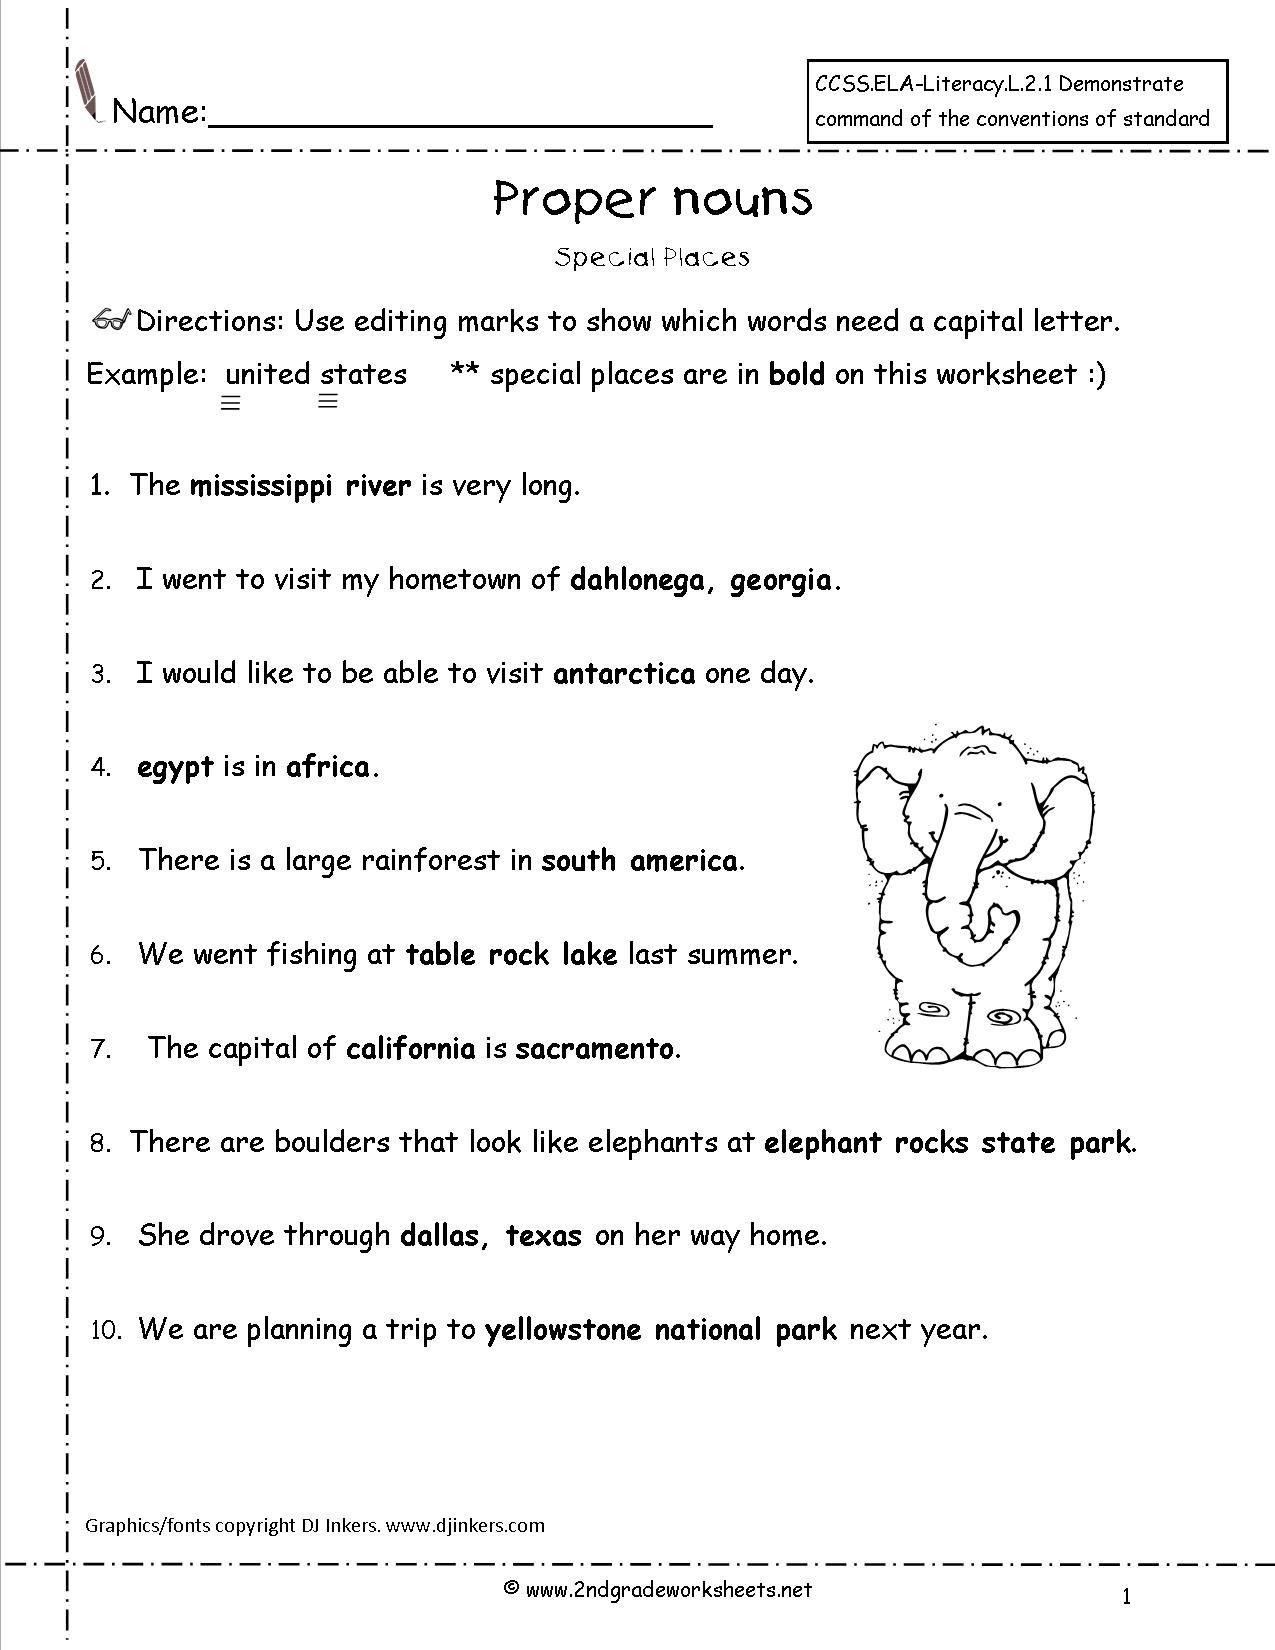 Proper nouns worksheets grade 3 proper nouns worksheet